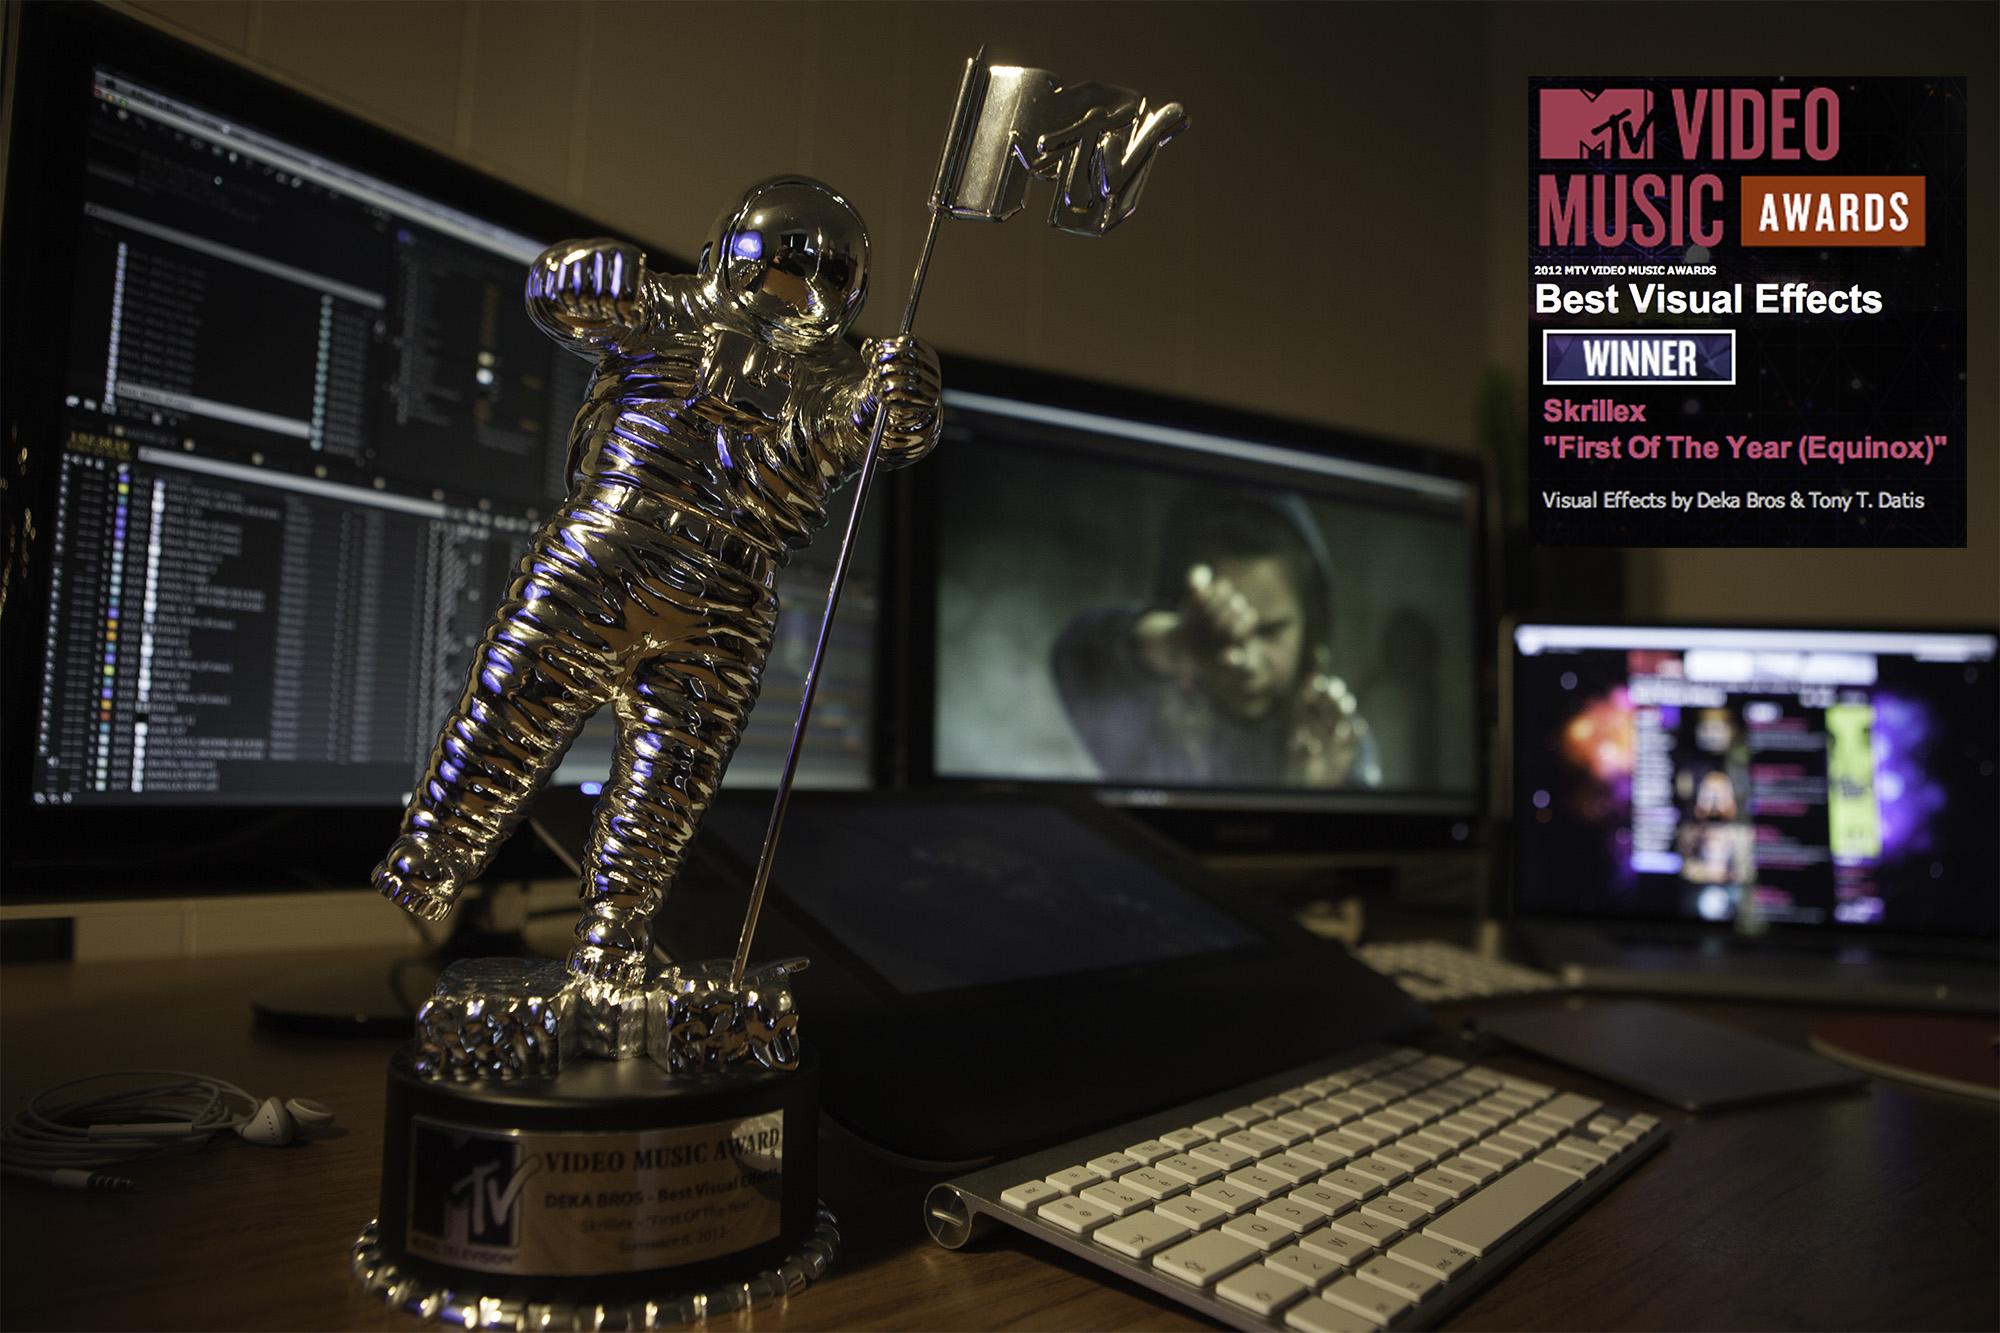 MTV VMA 2012 - Best Visual Effects - Winner Deka Bros & Tony T. Datis